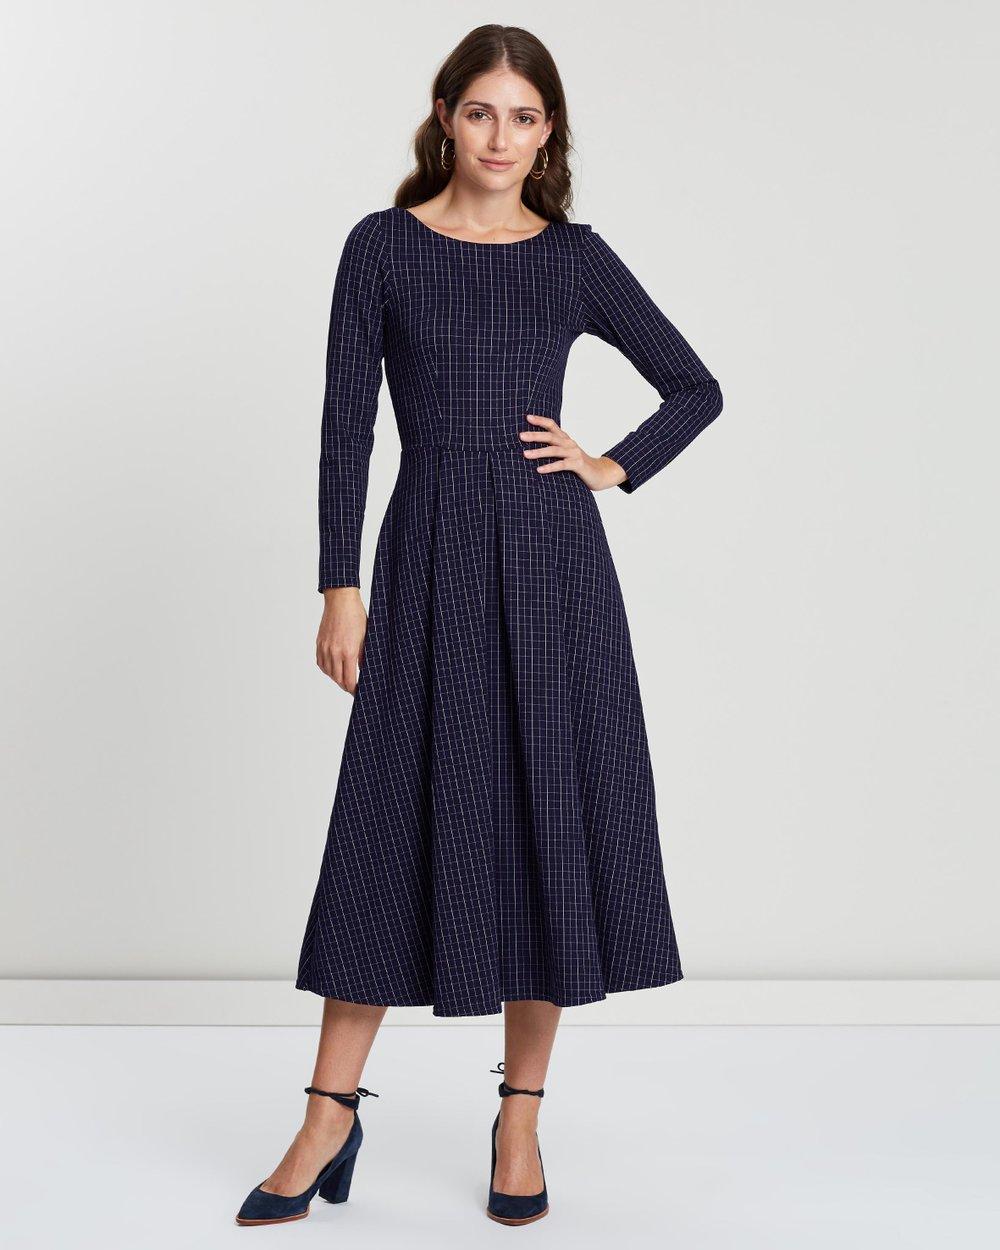 743c431da2 Pleated Full Skirt Dress by Closet London Online